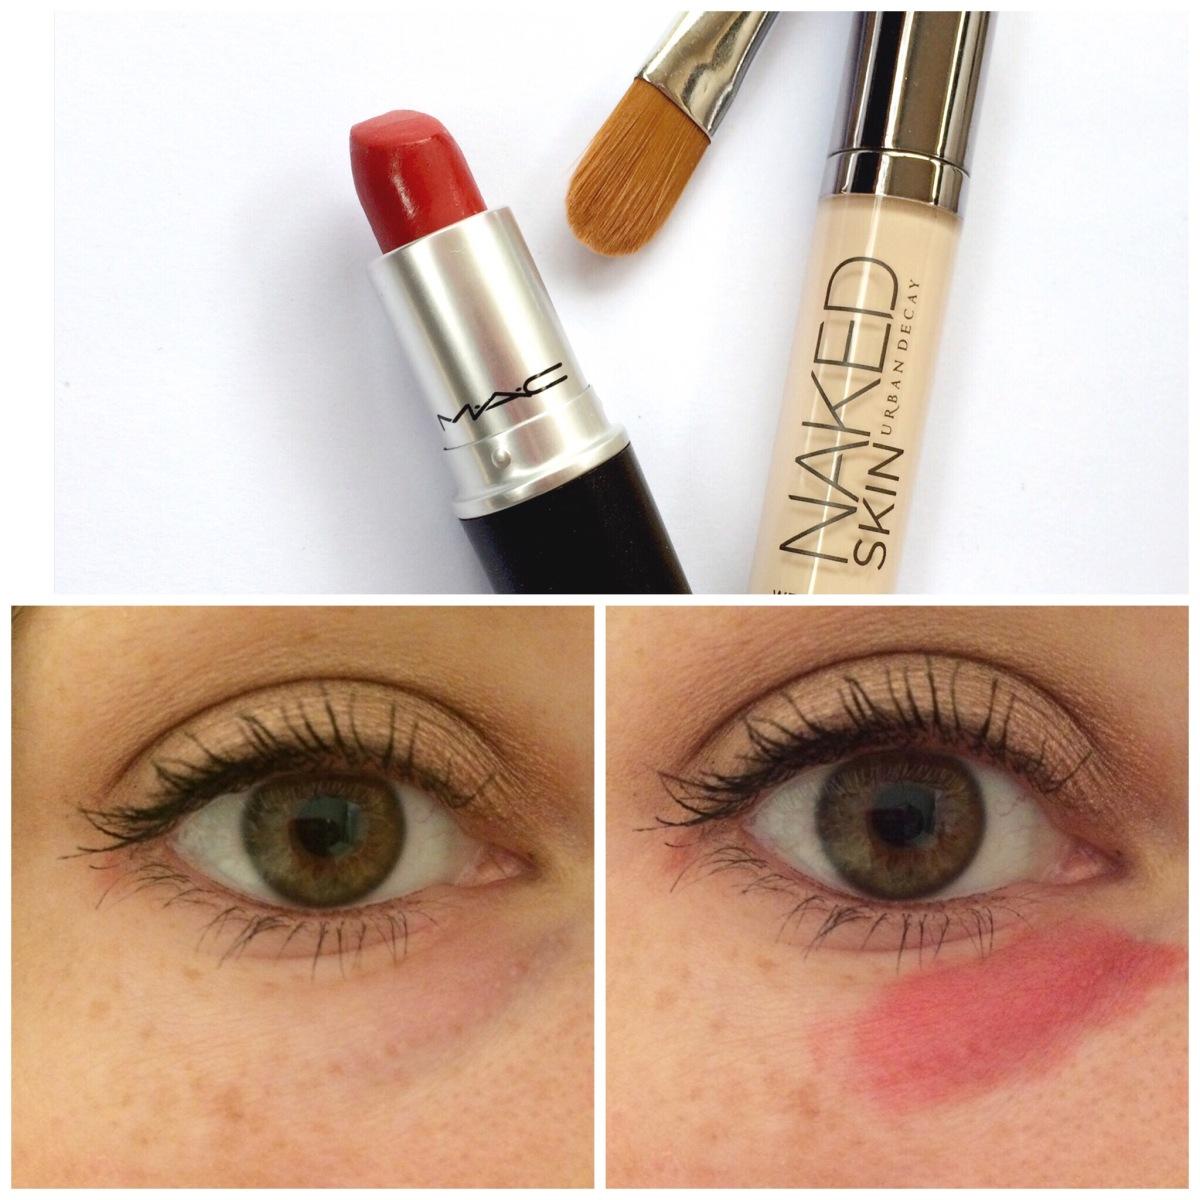 Red Lipstick as Under-eyeCorrector?